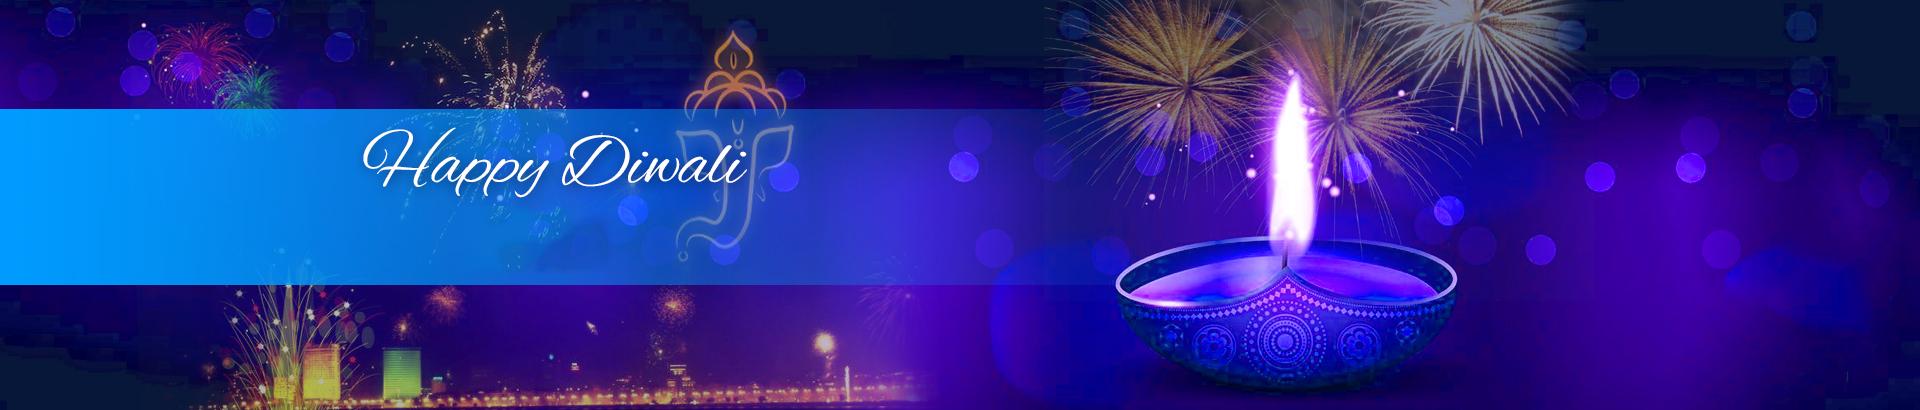 Happy Diwali 2017 banner